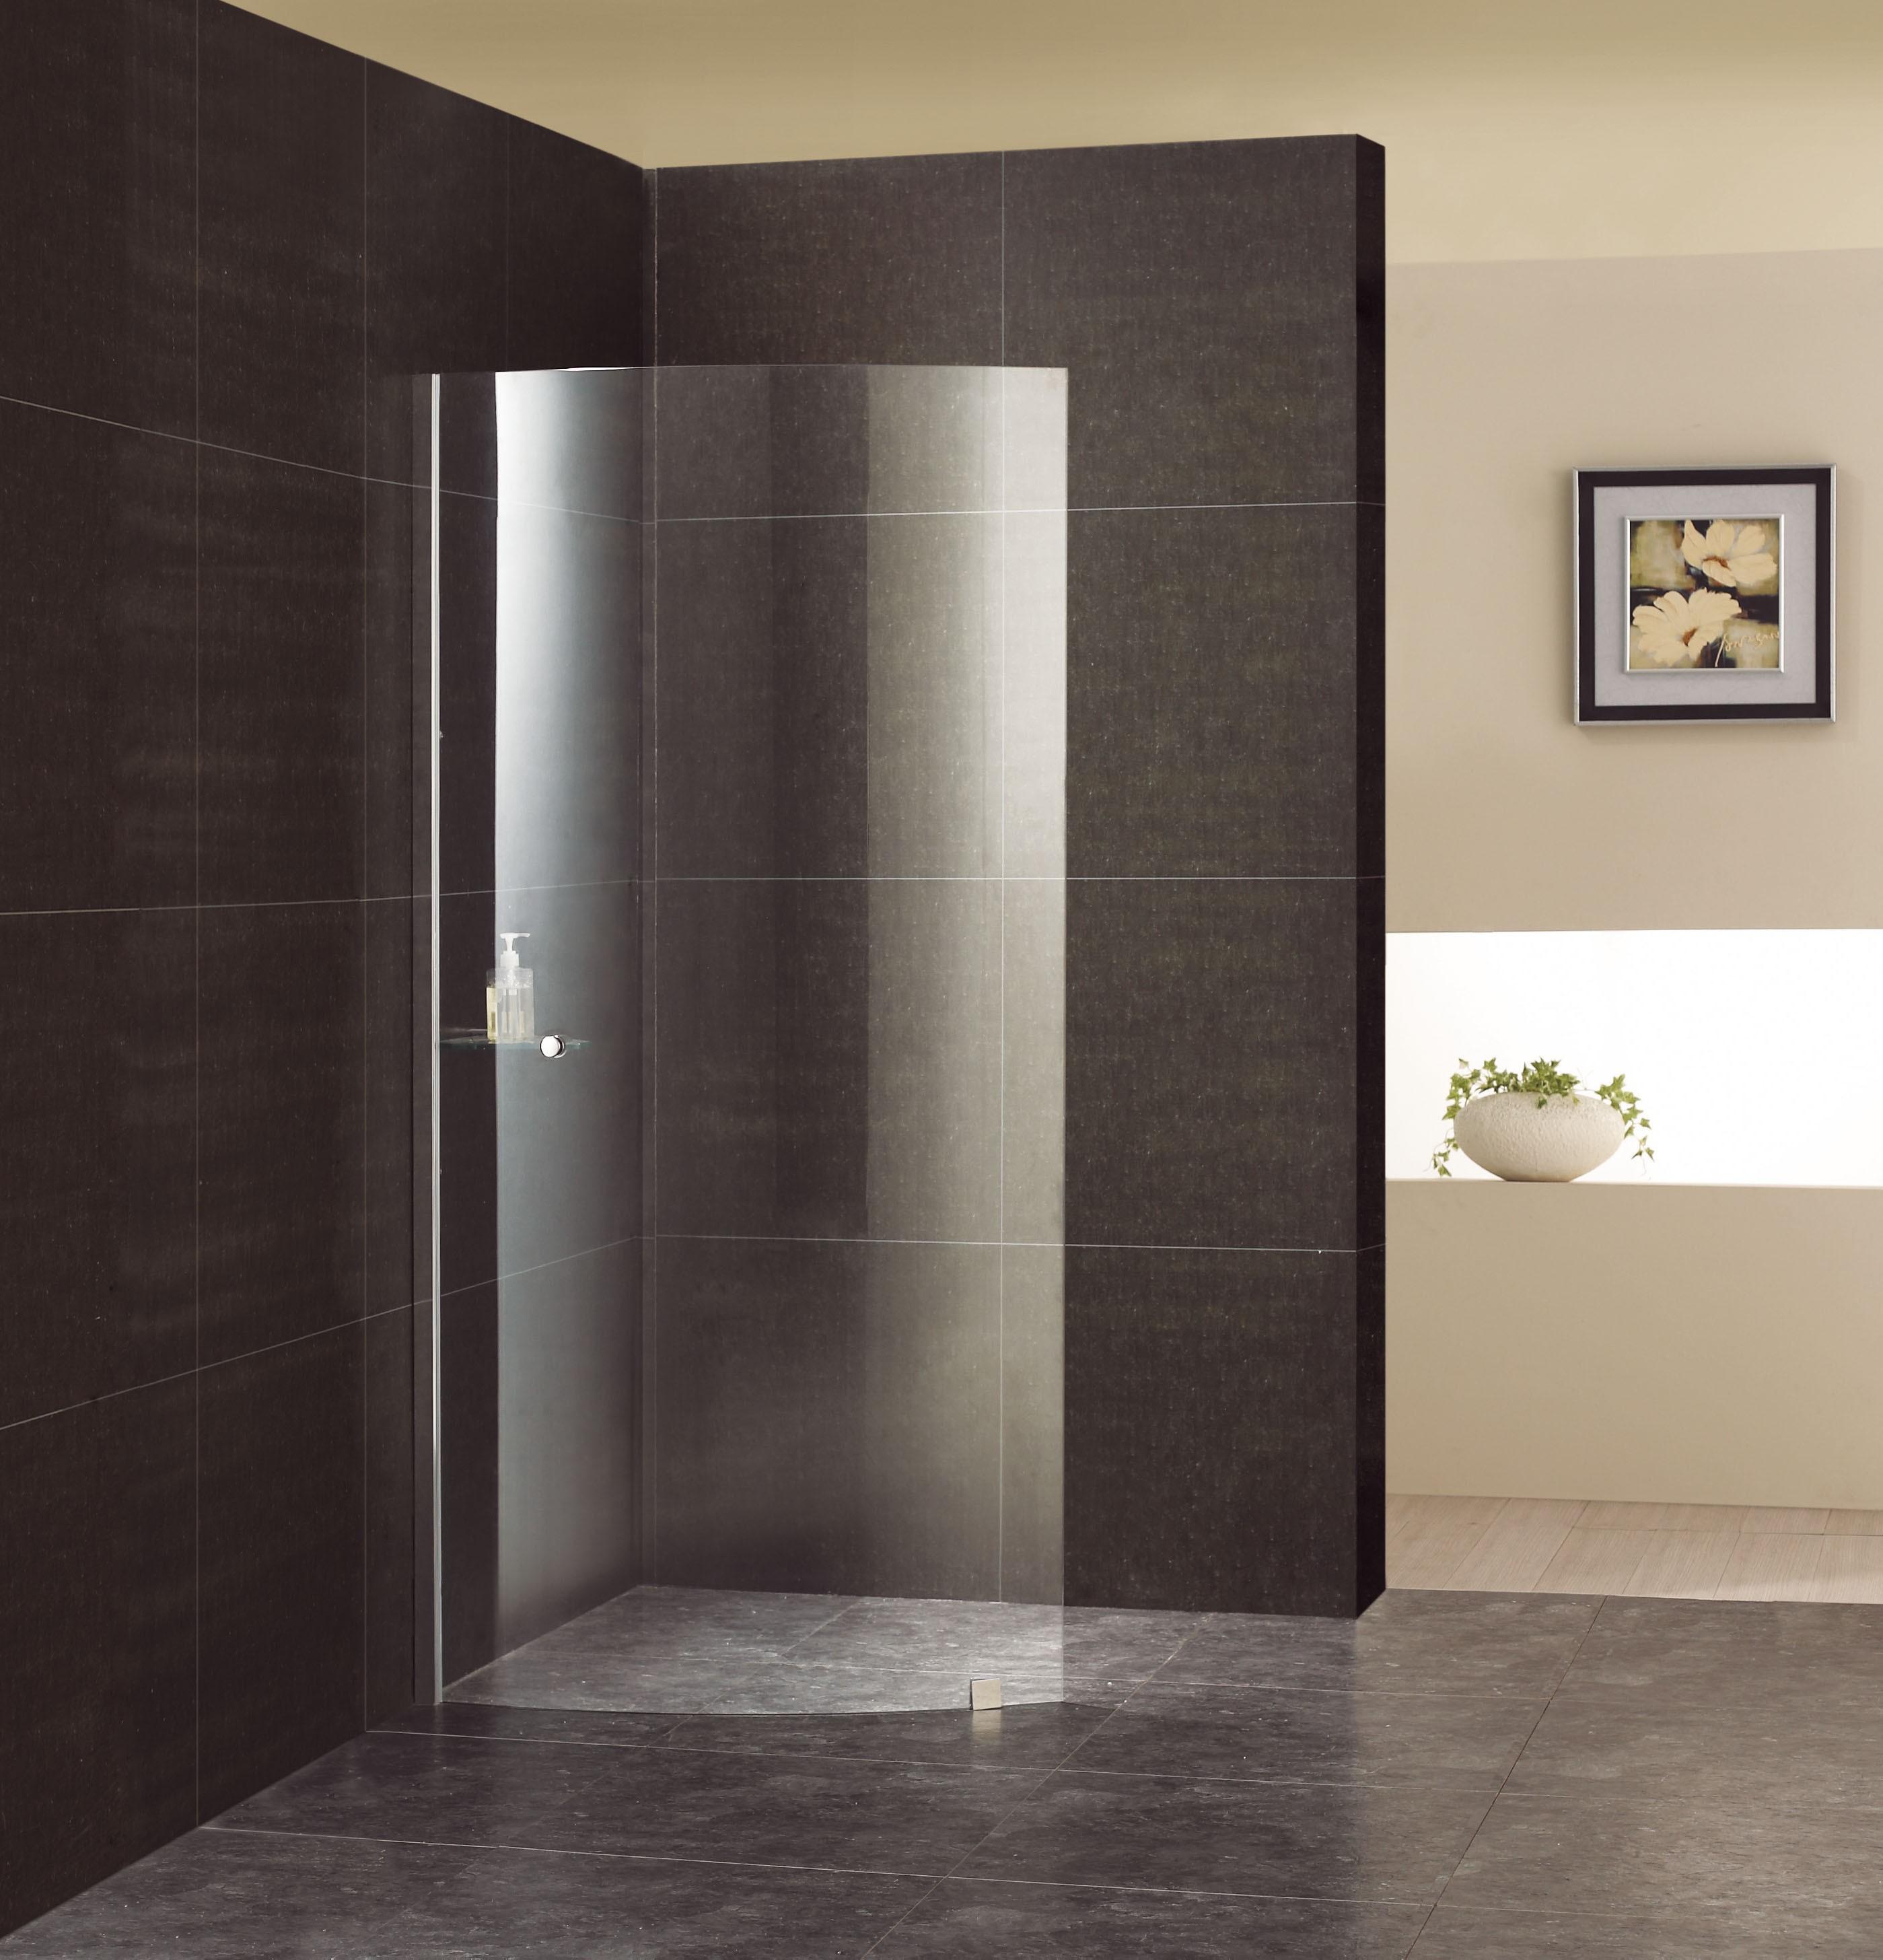 duschwand kasiopeian walk in klarglas rundelement linksbefestigung. Black Bedroom Furniture Sets. Home Design Ideas